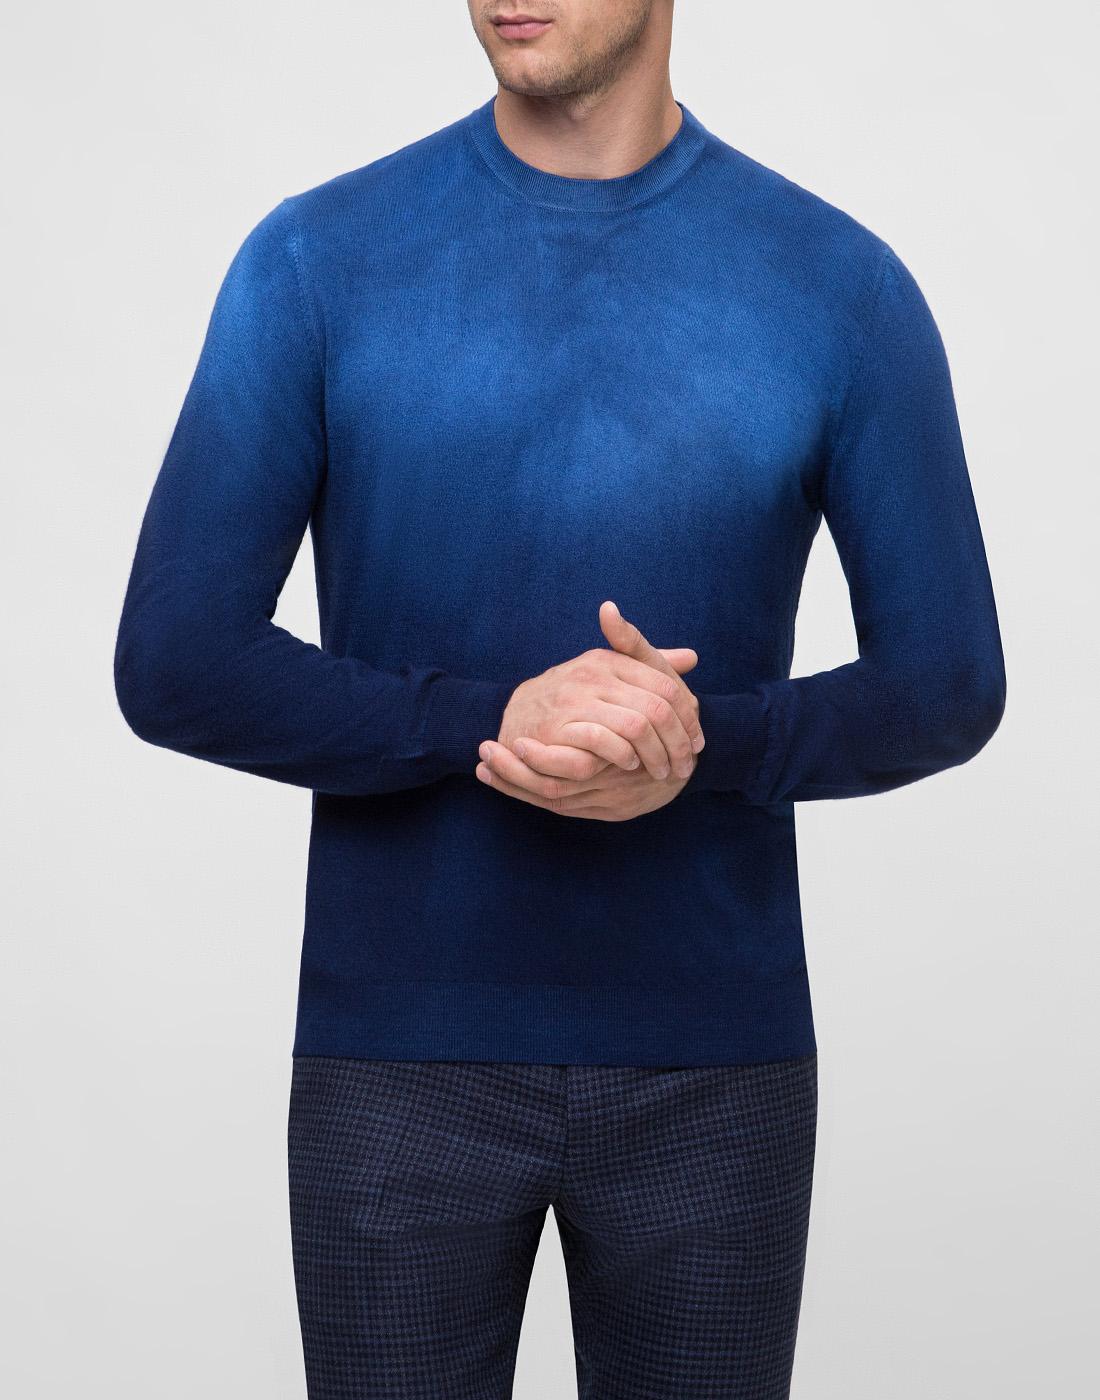 Мужской темно-синий джемпер  Bertolo S901638-2